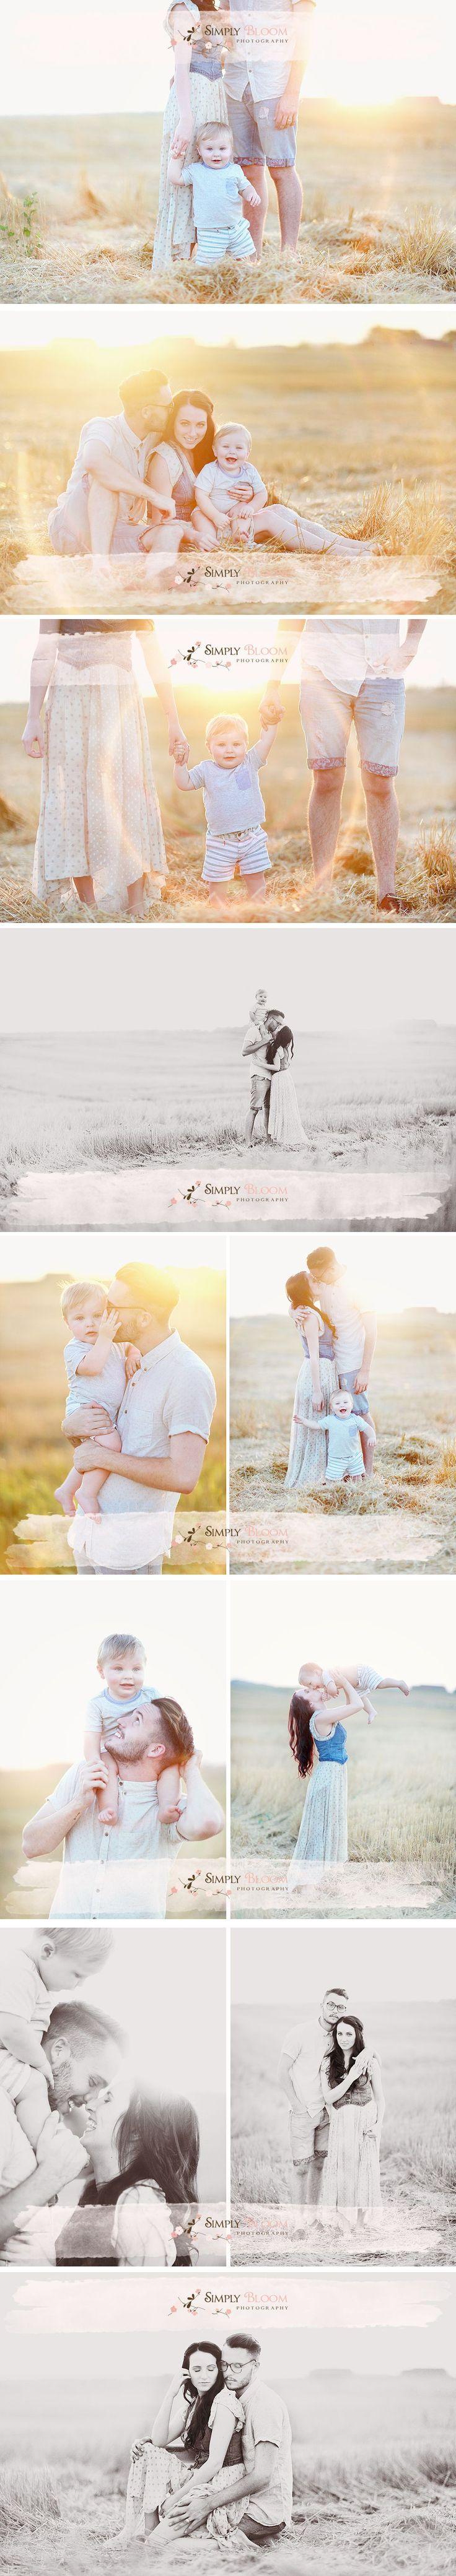 Mejores 5356 imágenes de Photography ideas en Pinterest | Ajustes de ...